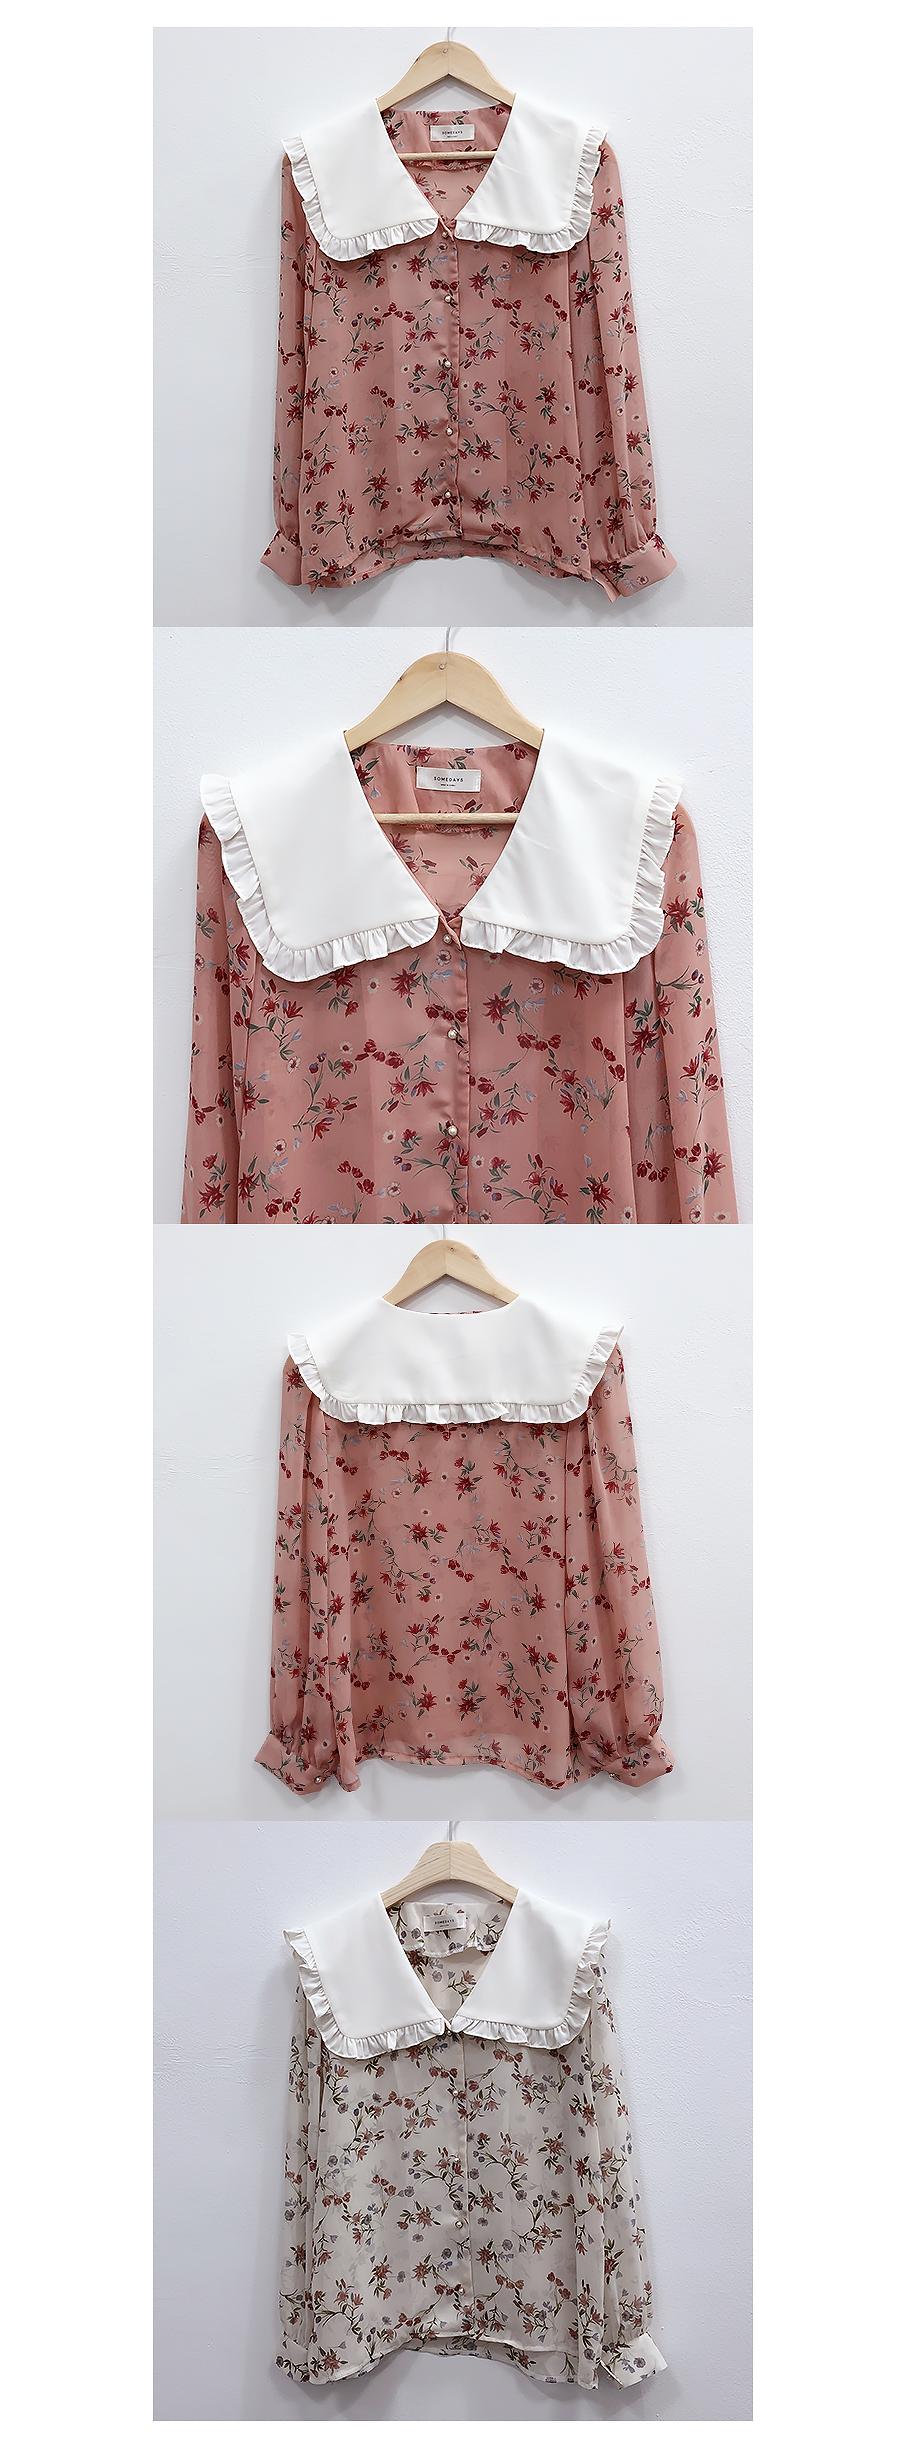 Self-made ♥ rose ruffle collar blouse